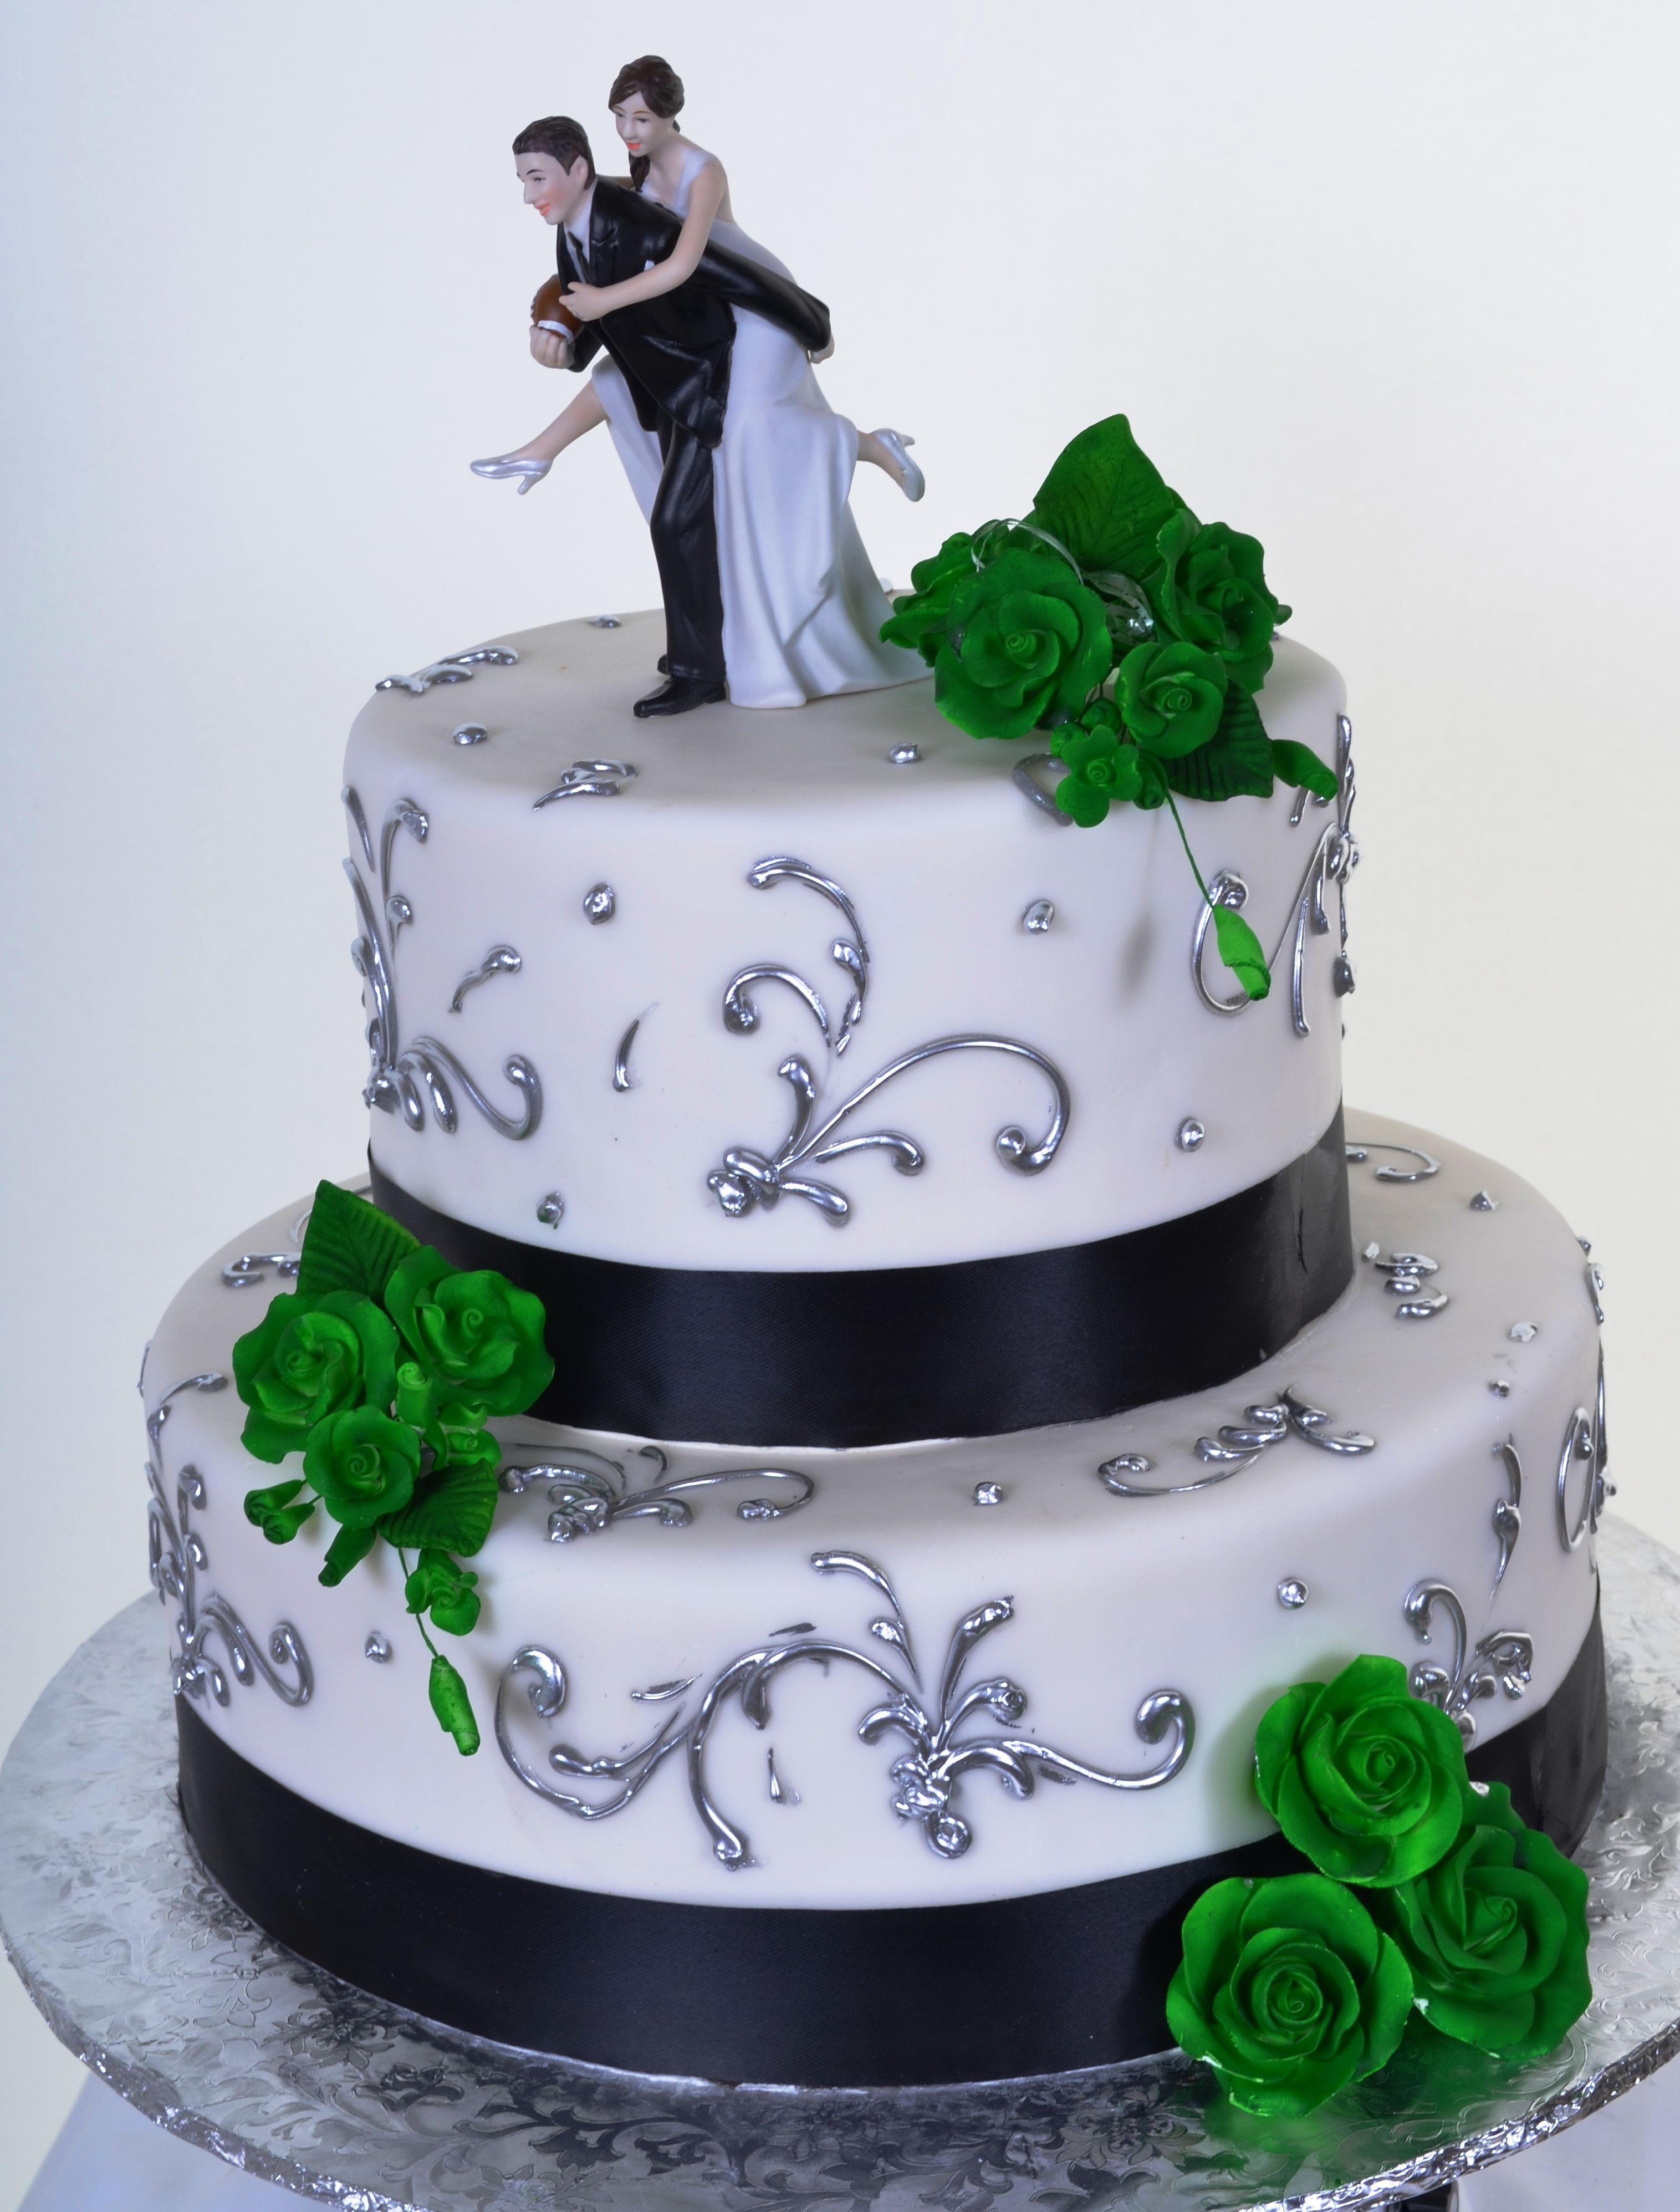 pastry palace las vegas - wedding cake #907 – irish roses. white